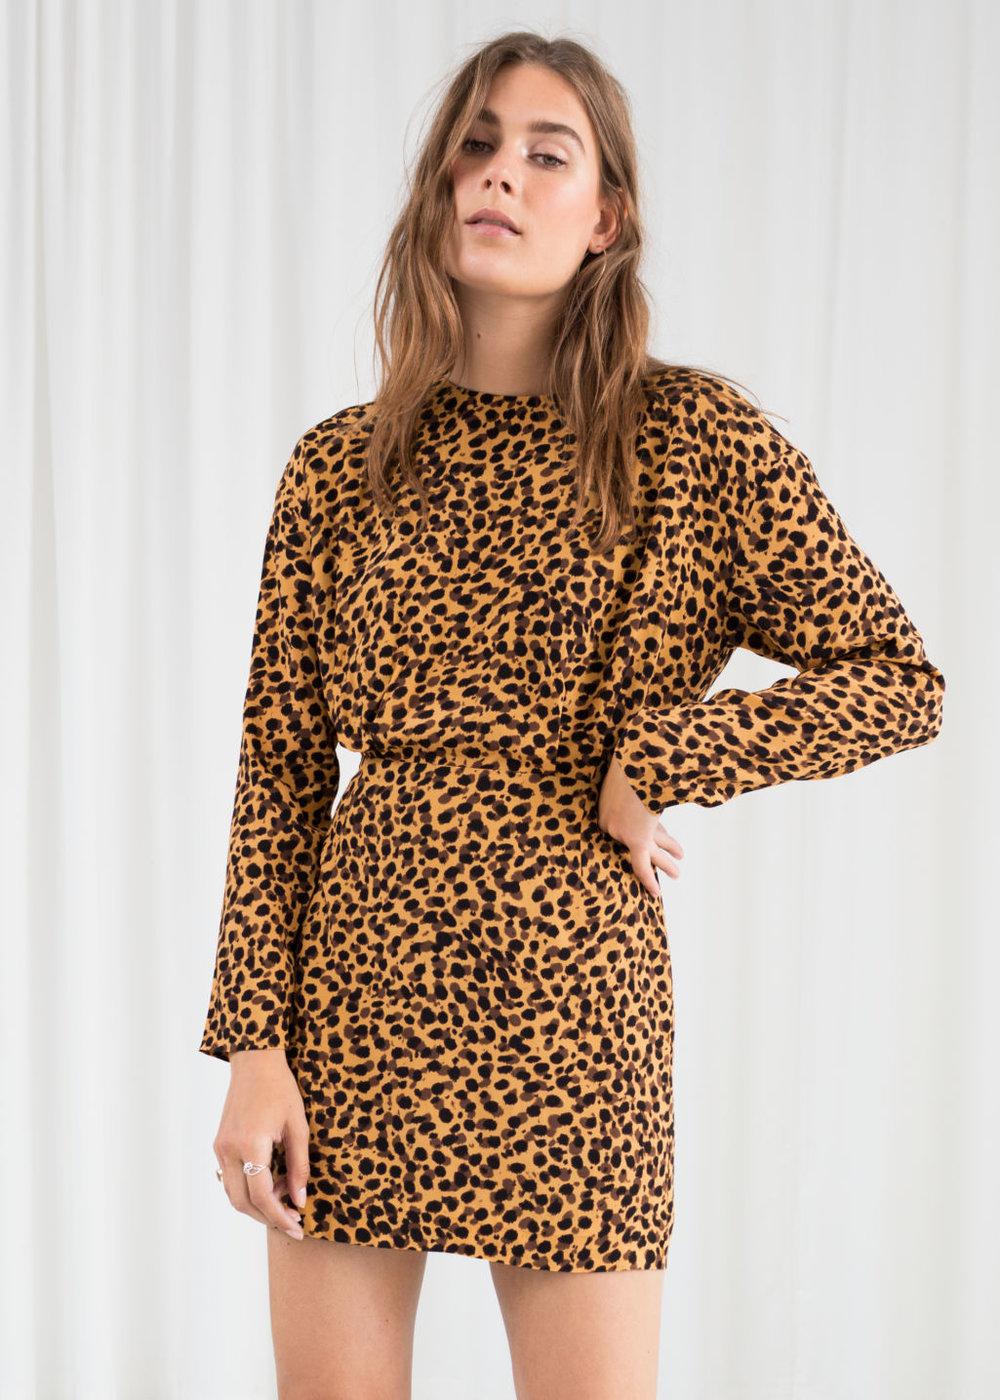 leopard print dress - & other stories